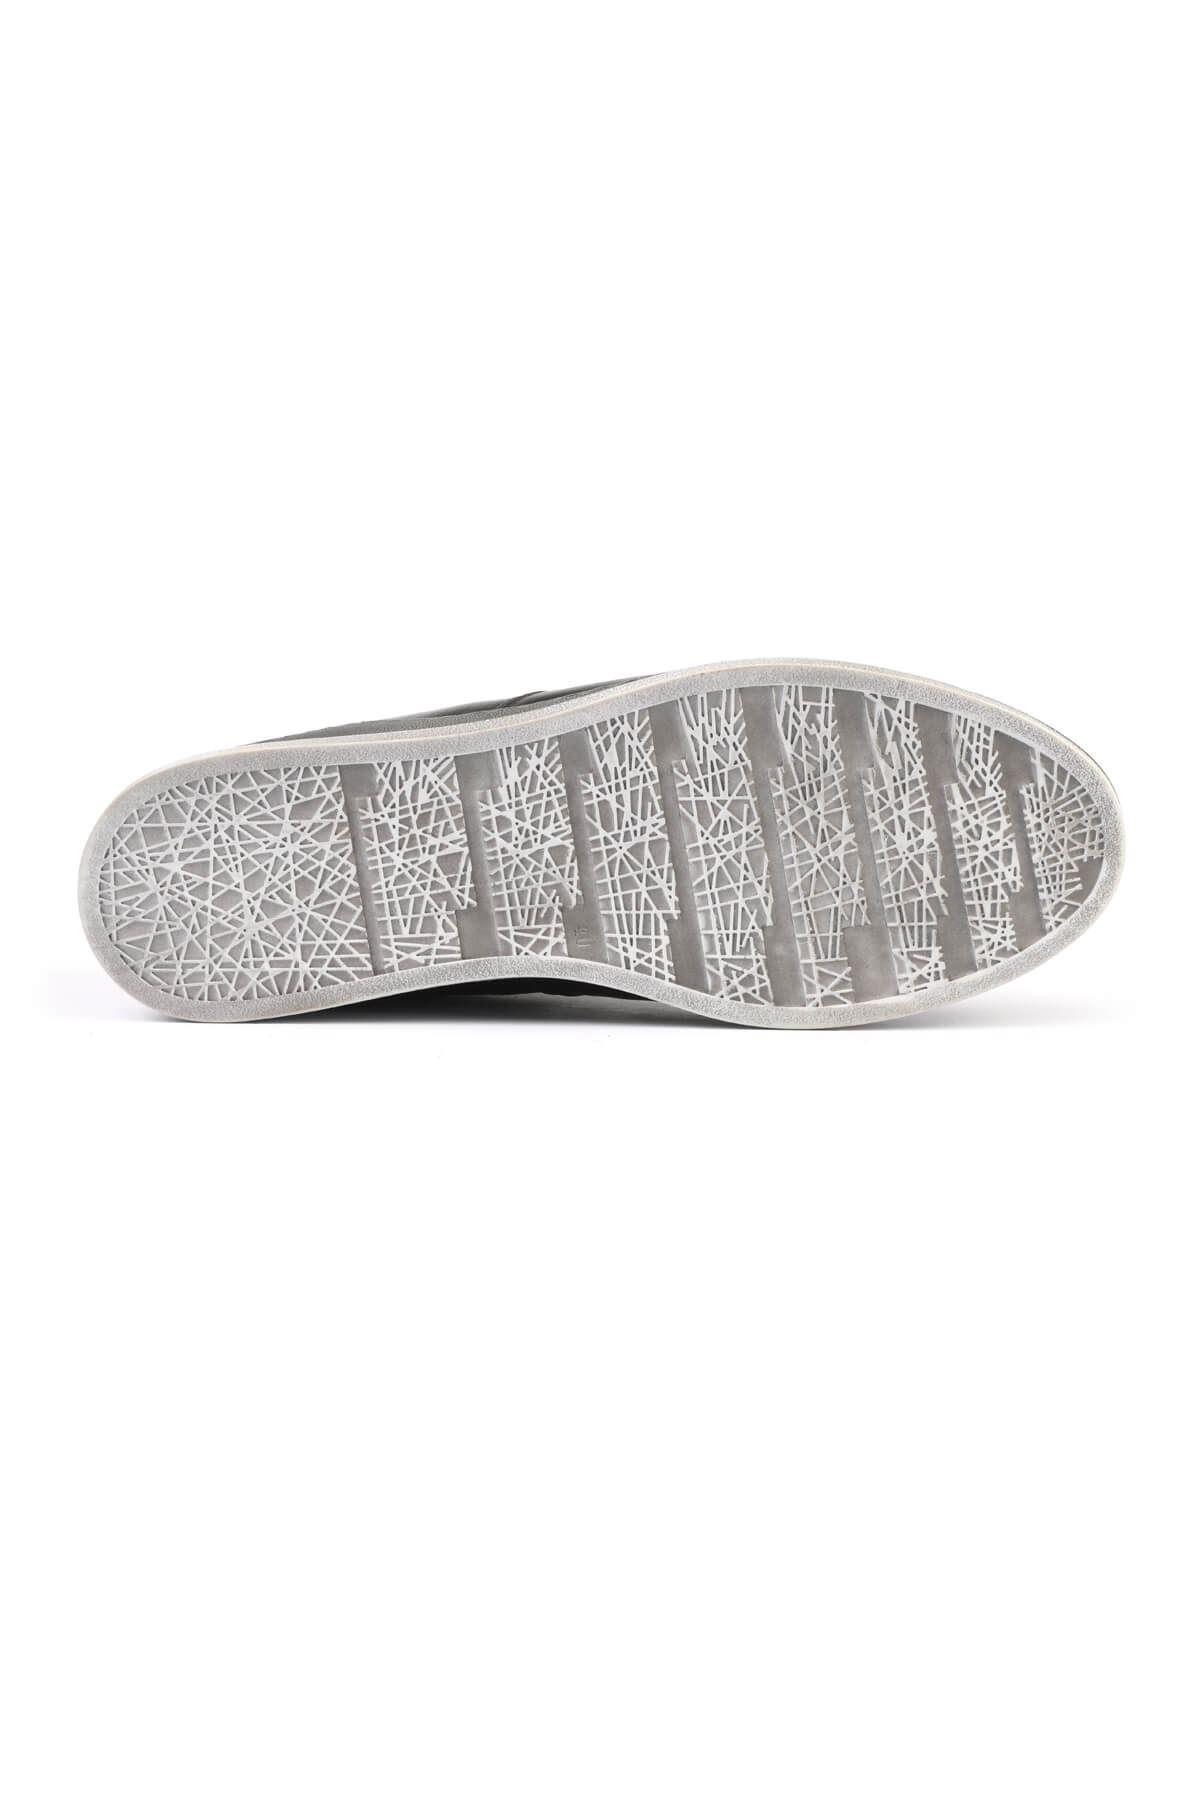 Libero 3196 Black Gray Sneaker Shoes